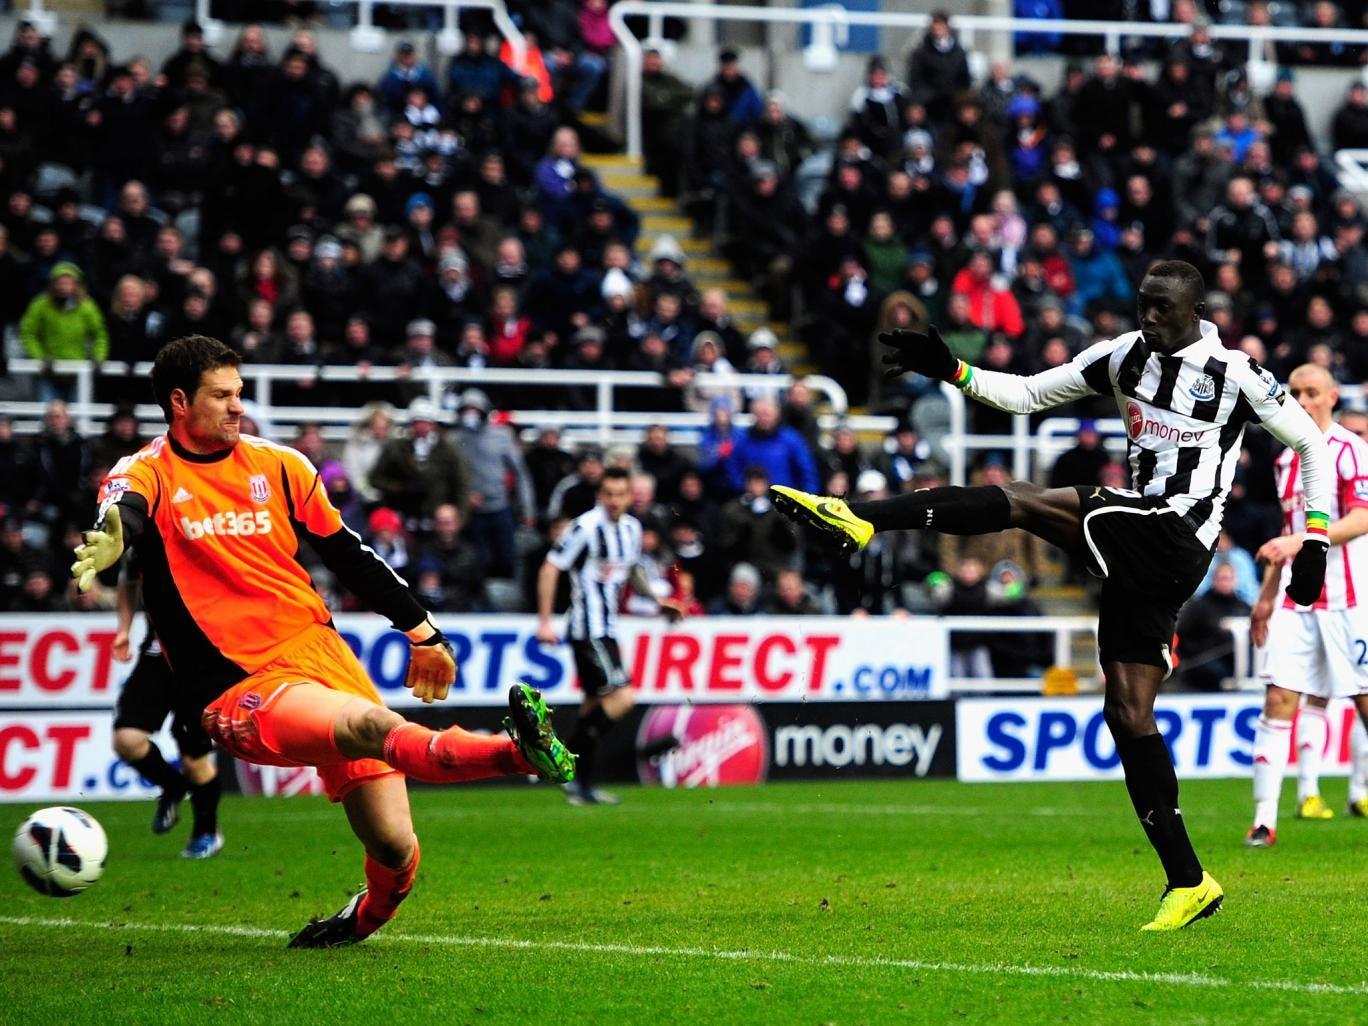 Stoke keeper Asmir Bergovic is beaten by Newcastle forward Papiss Cisse